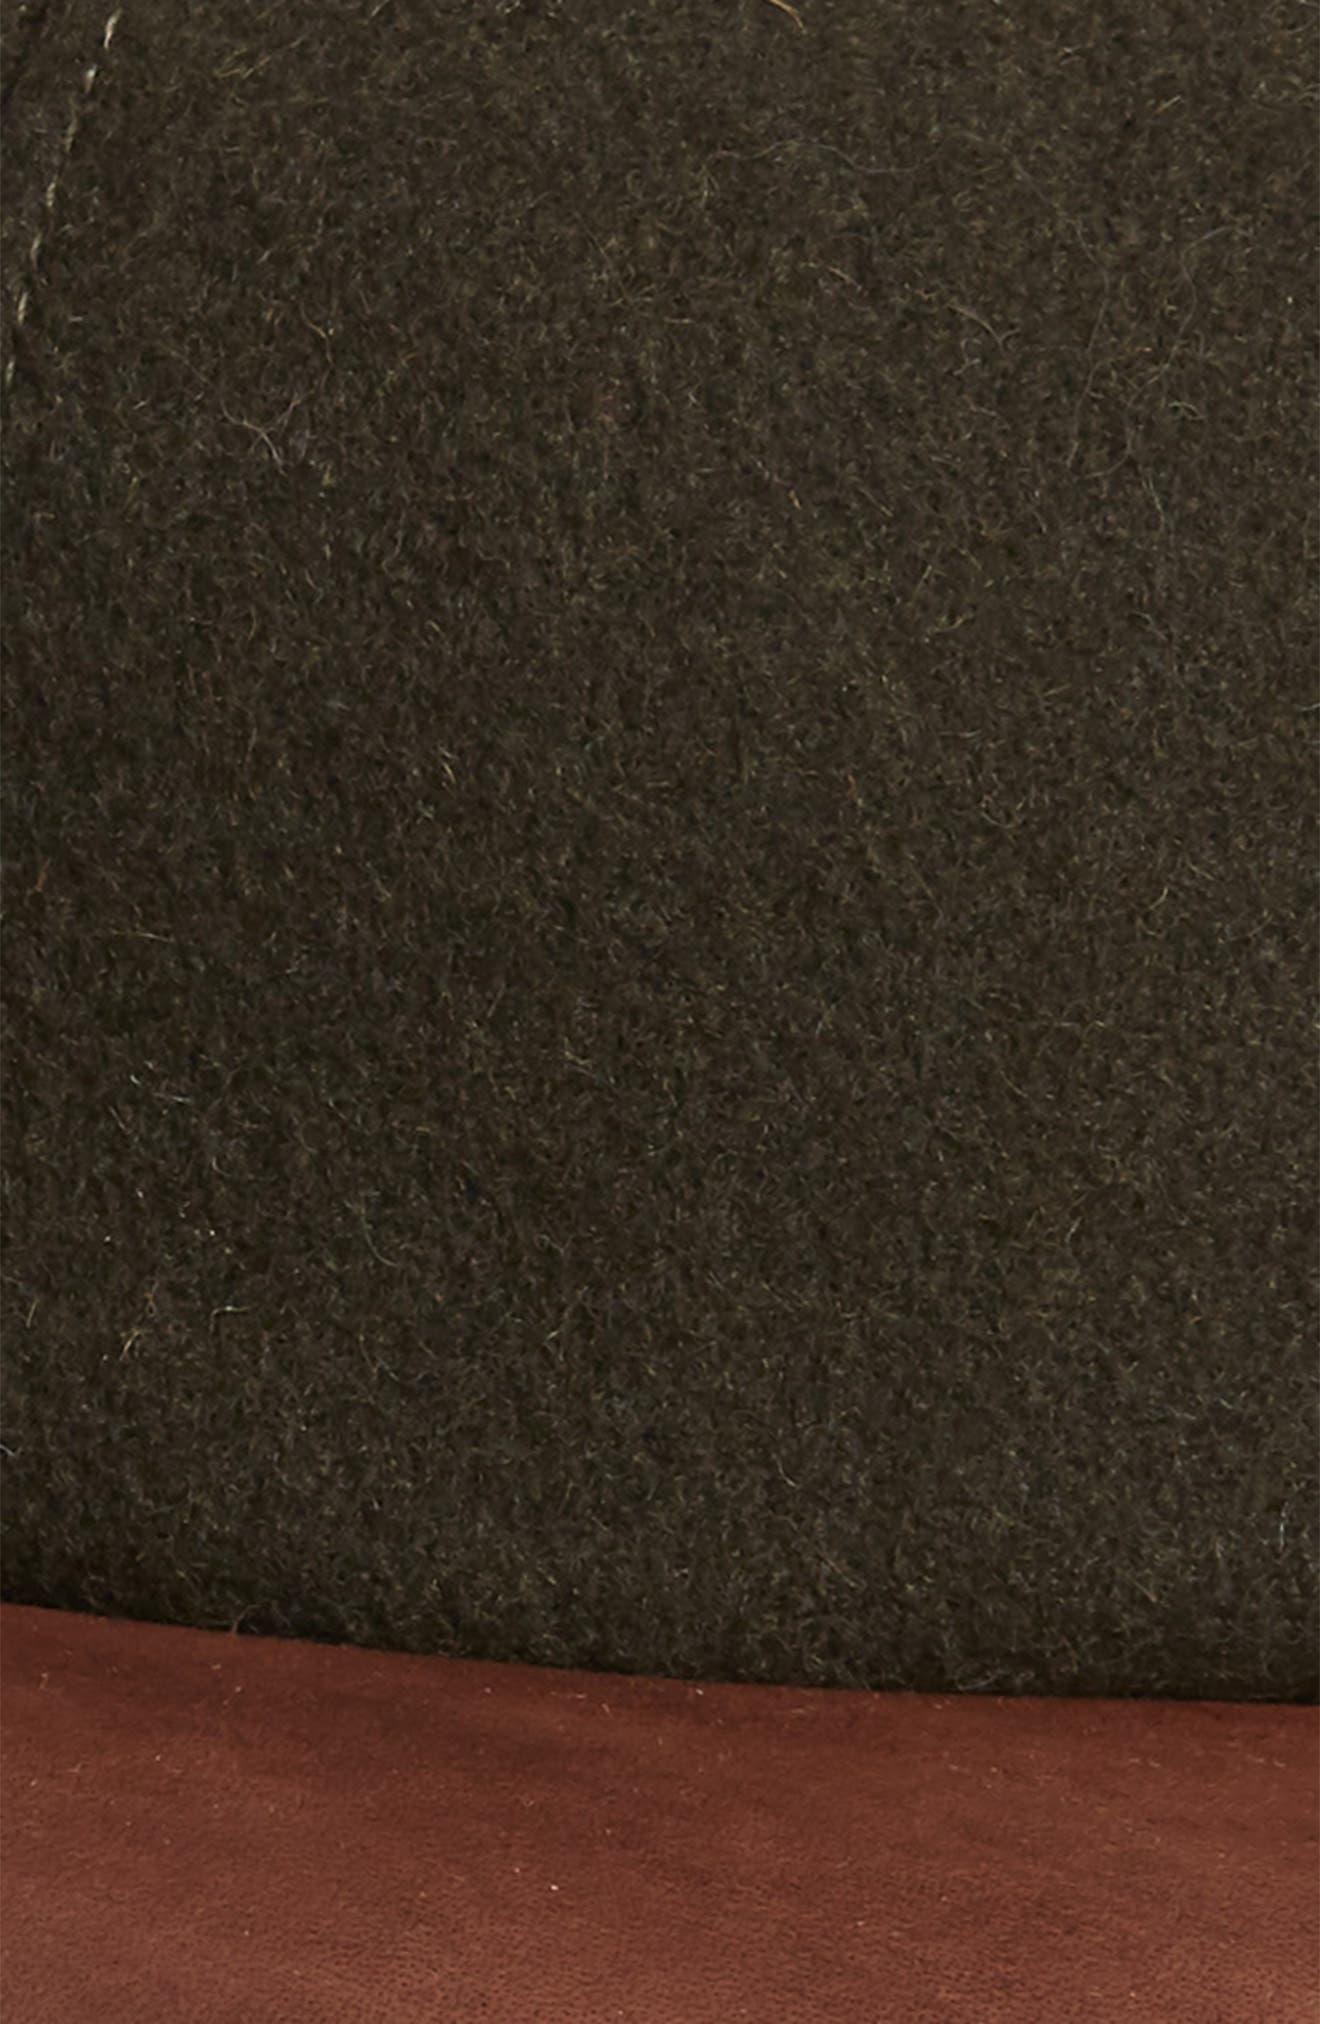 Melton Wool Blend Baseball Cap,                             Alternate thumbnail 3, color,                             LODEN